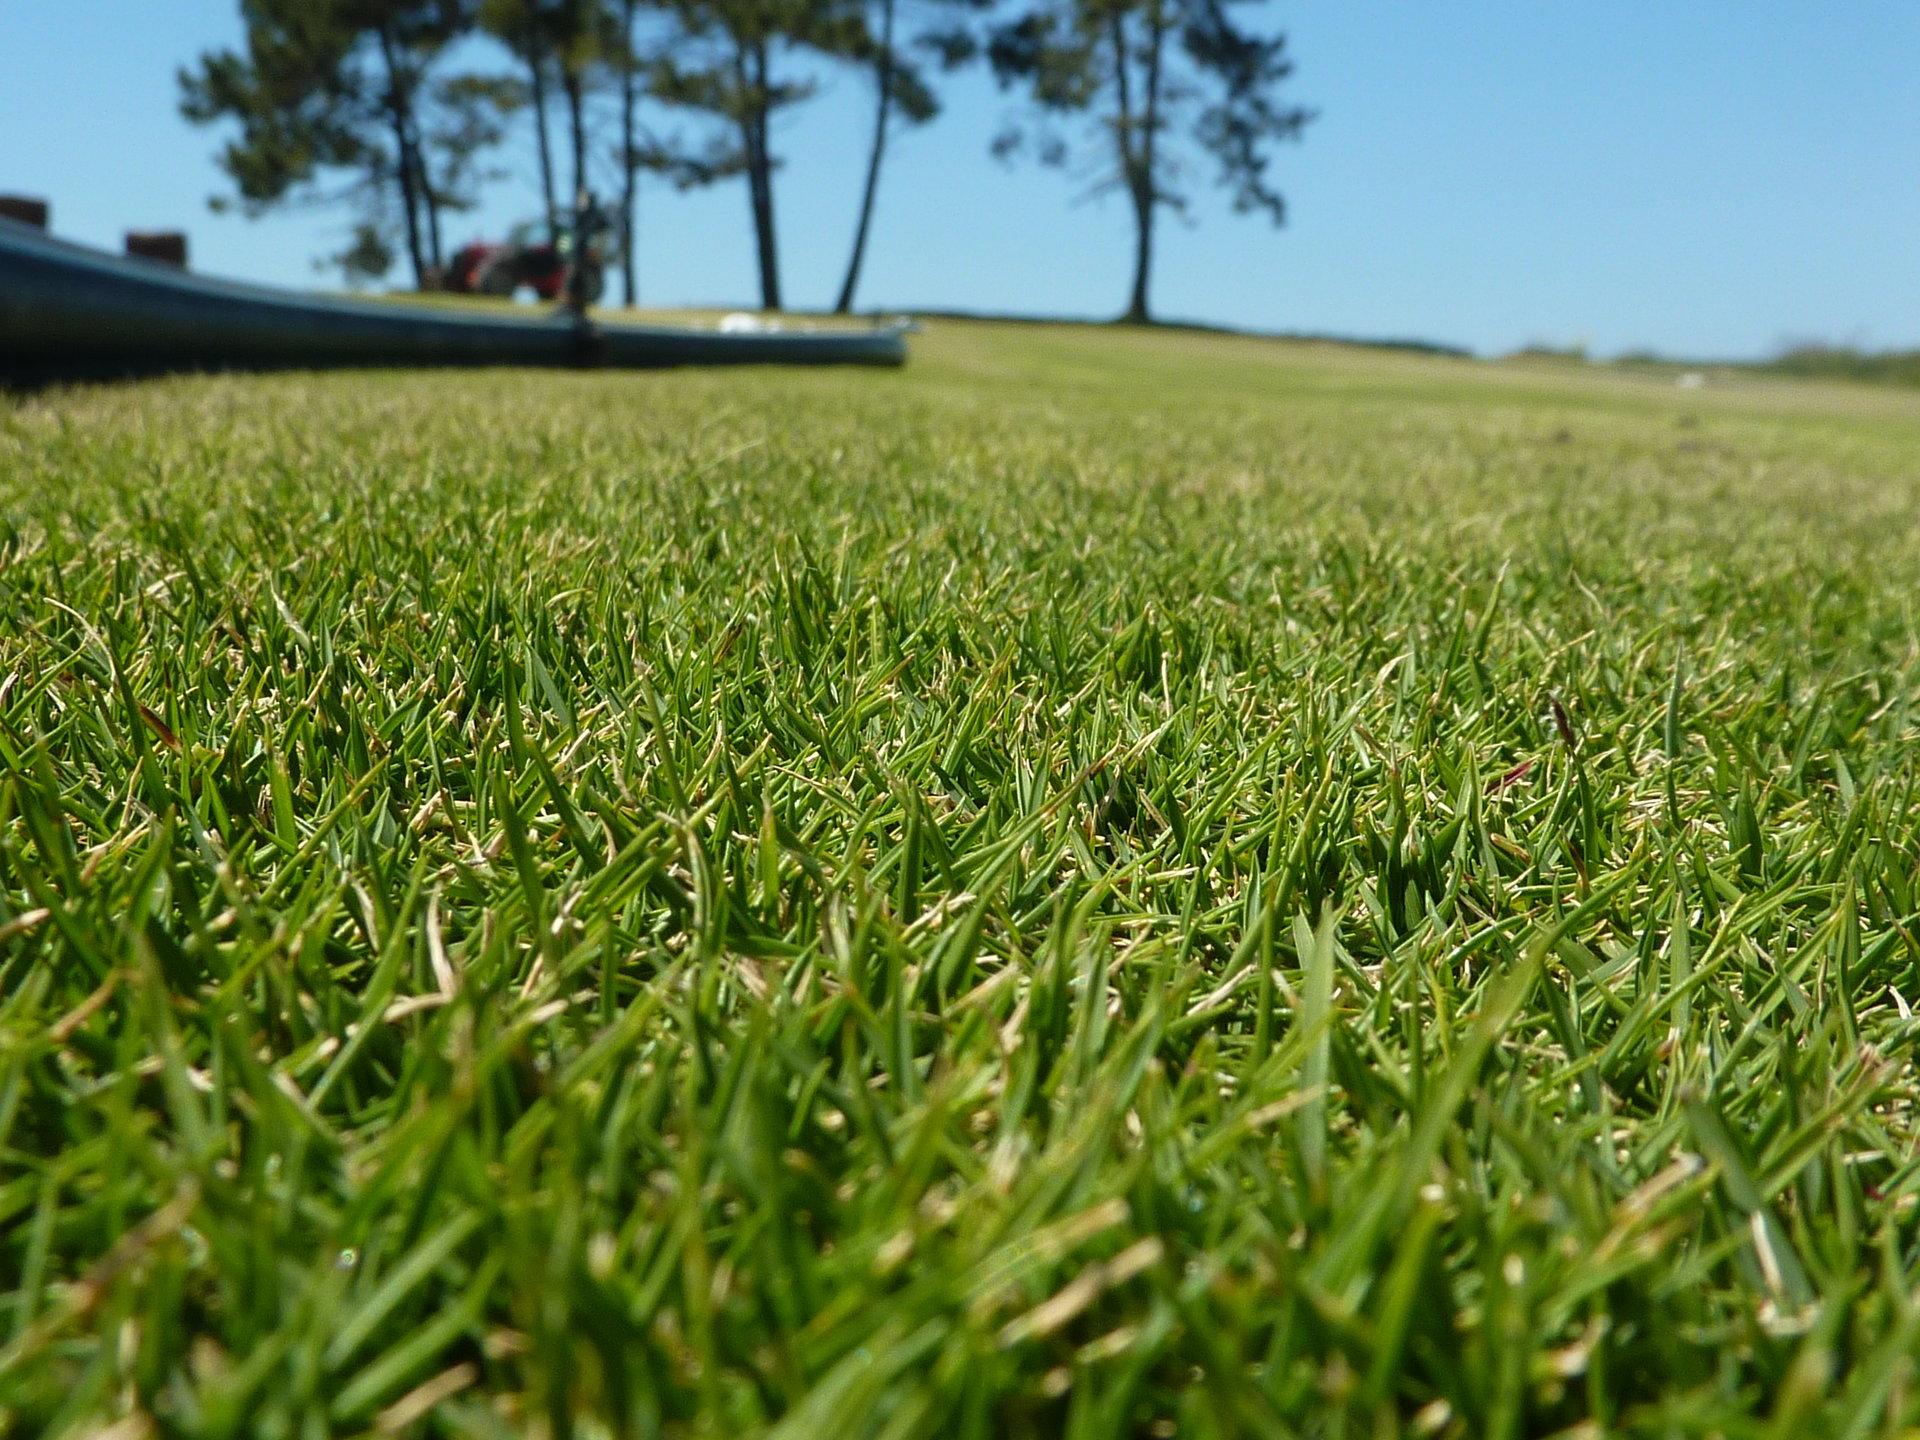 Bien planifier sa tonte de pelouse adg - Quand semer gazon ...